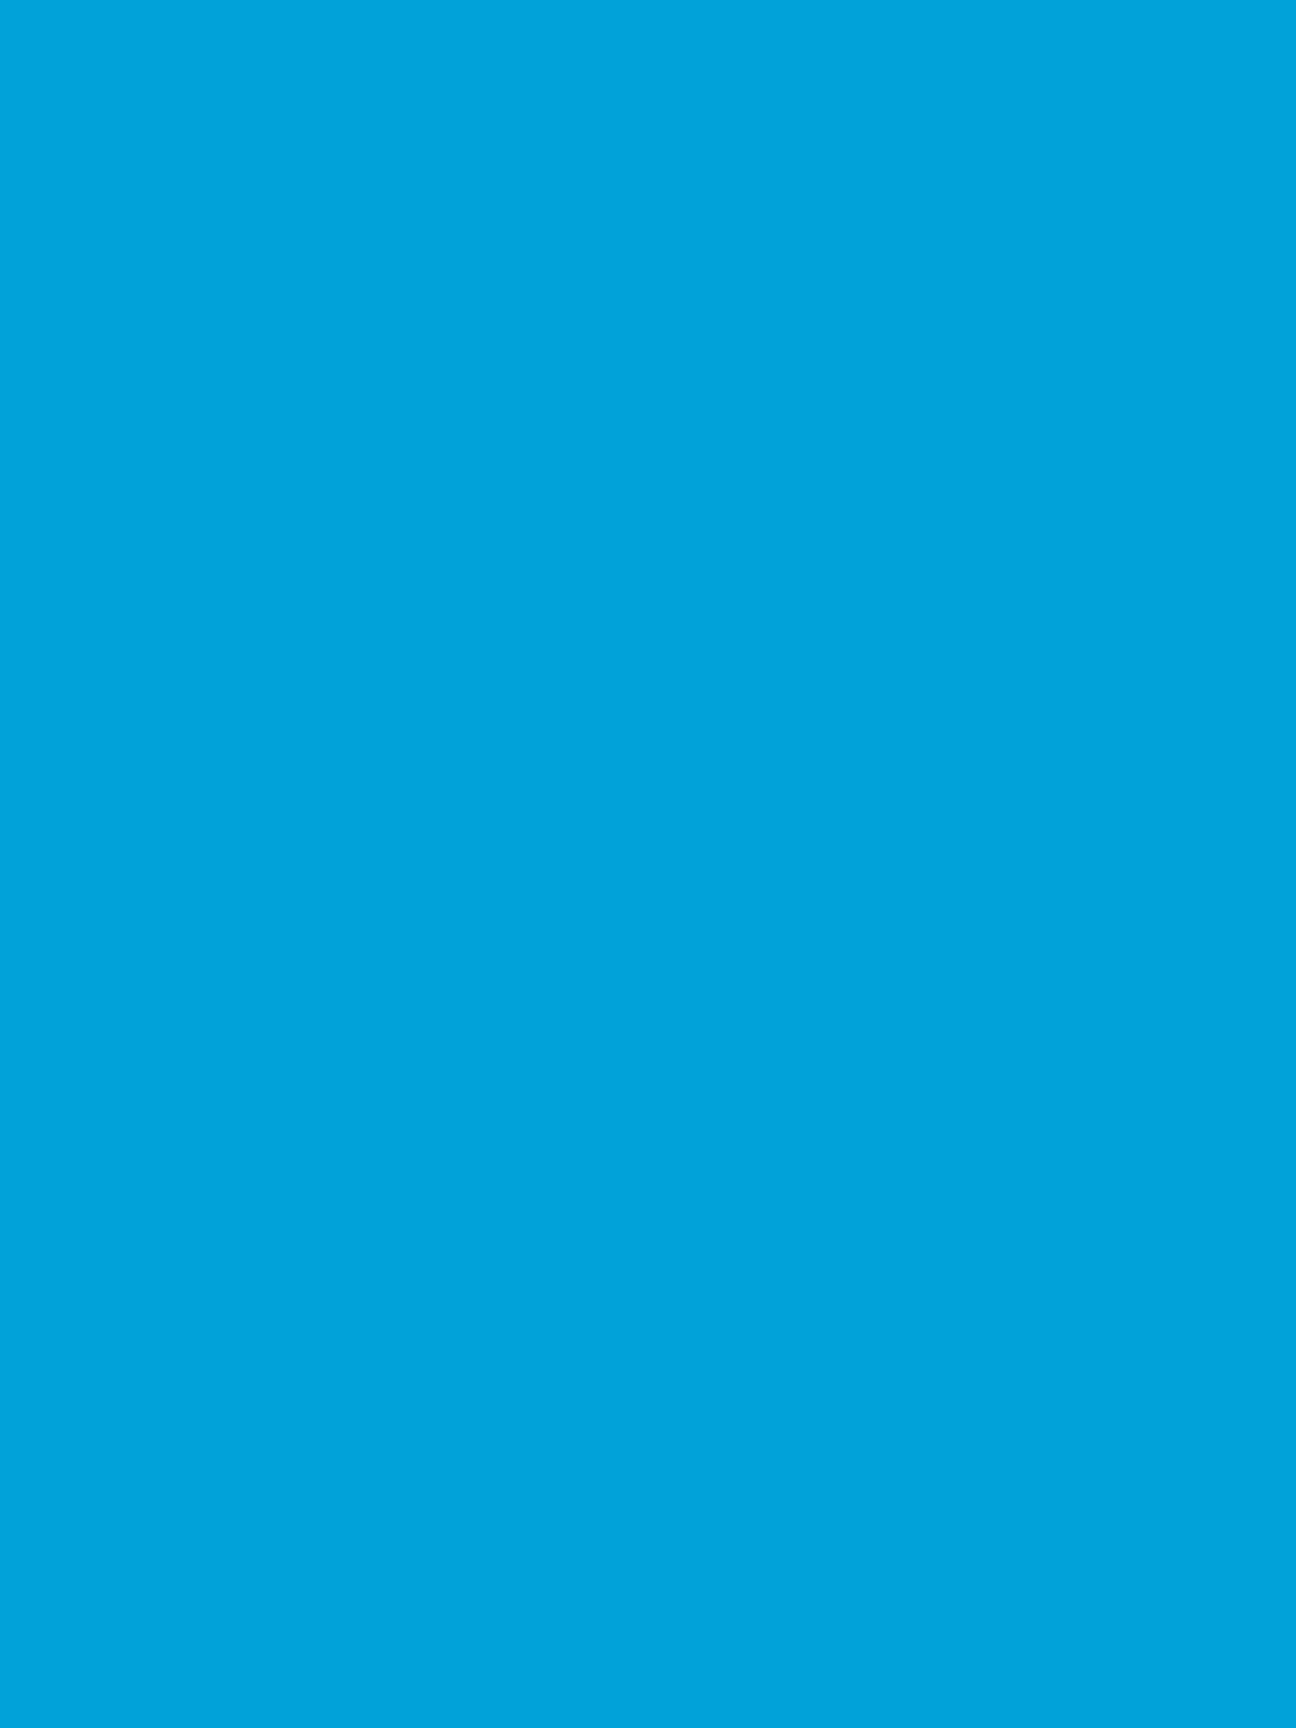 Greenwich-type-poster-blue.jpg